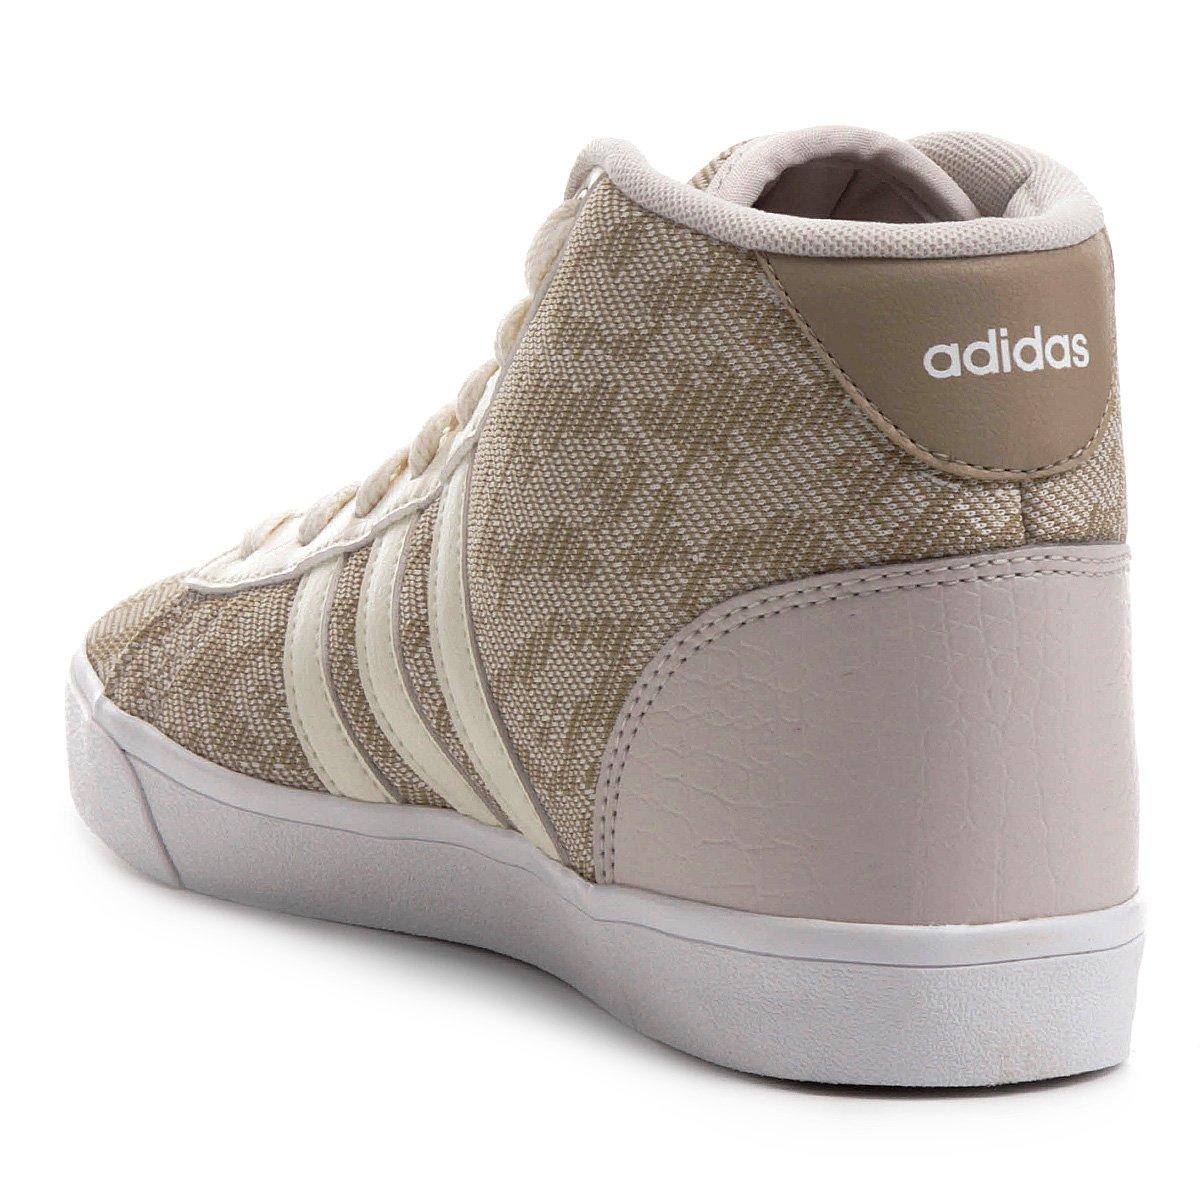 Tênis Adidas Cf Daily Qt Mid Feminino - Bege - Compre Agora  00276c916a0ae